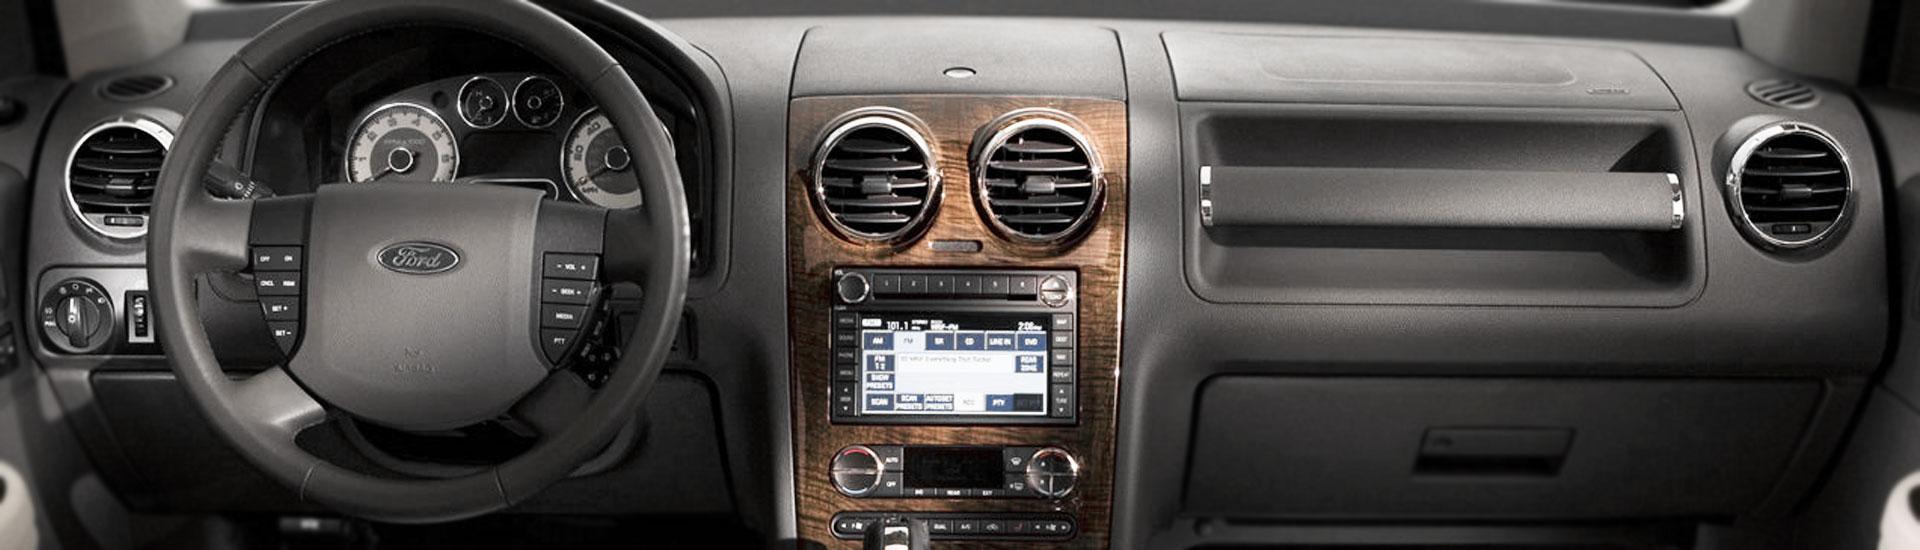 Ford taurus x custom dash kits